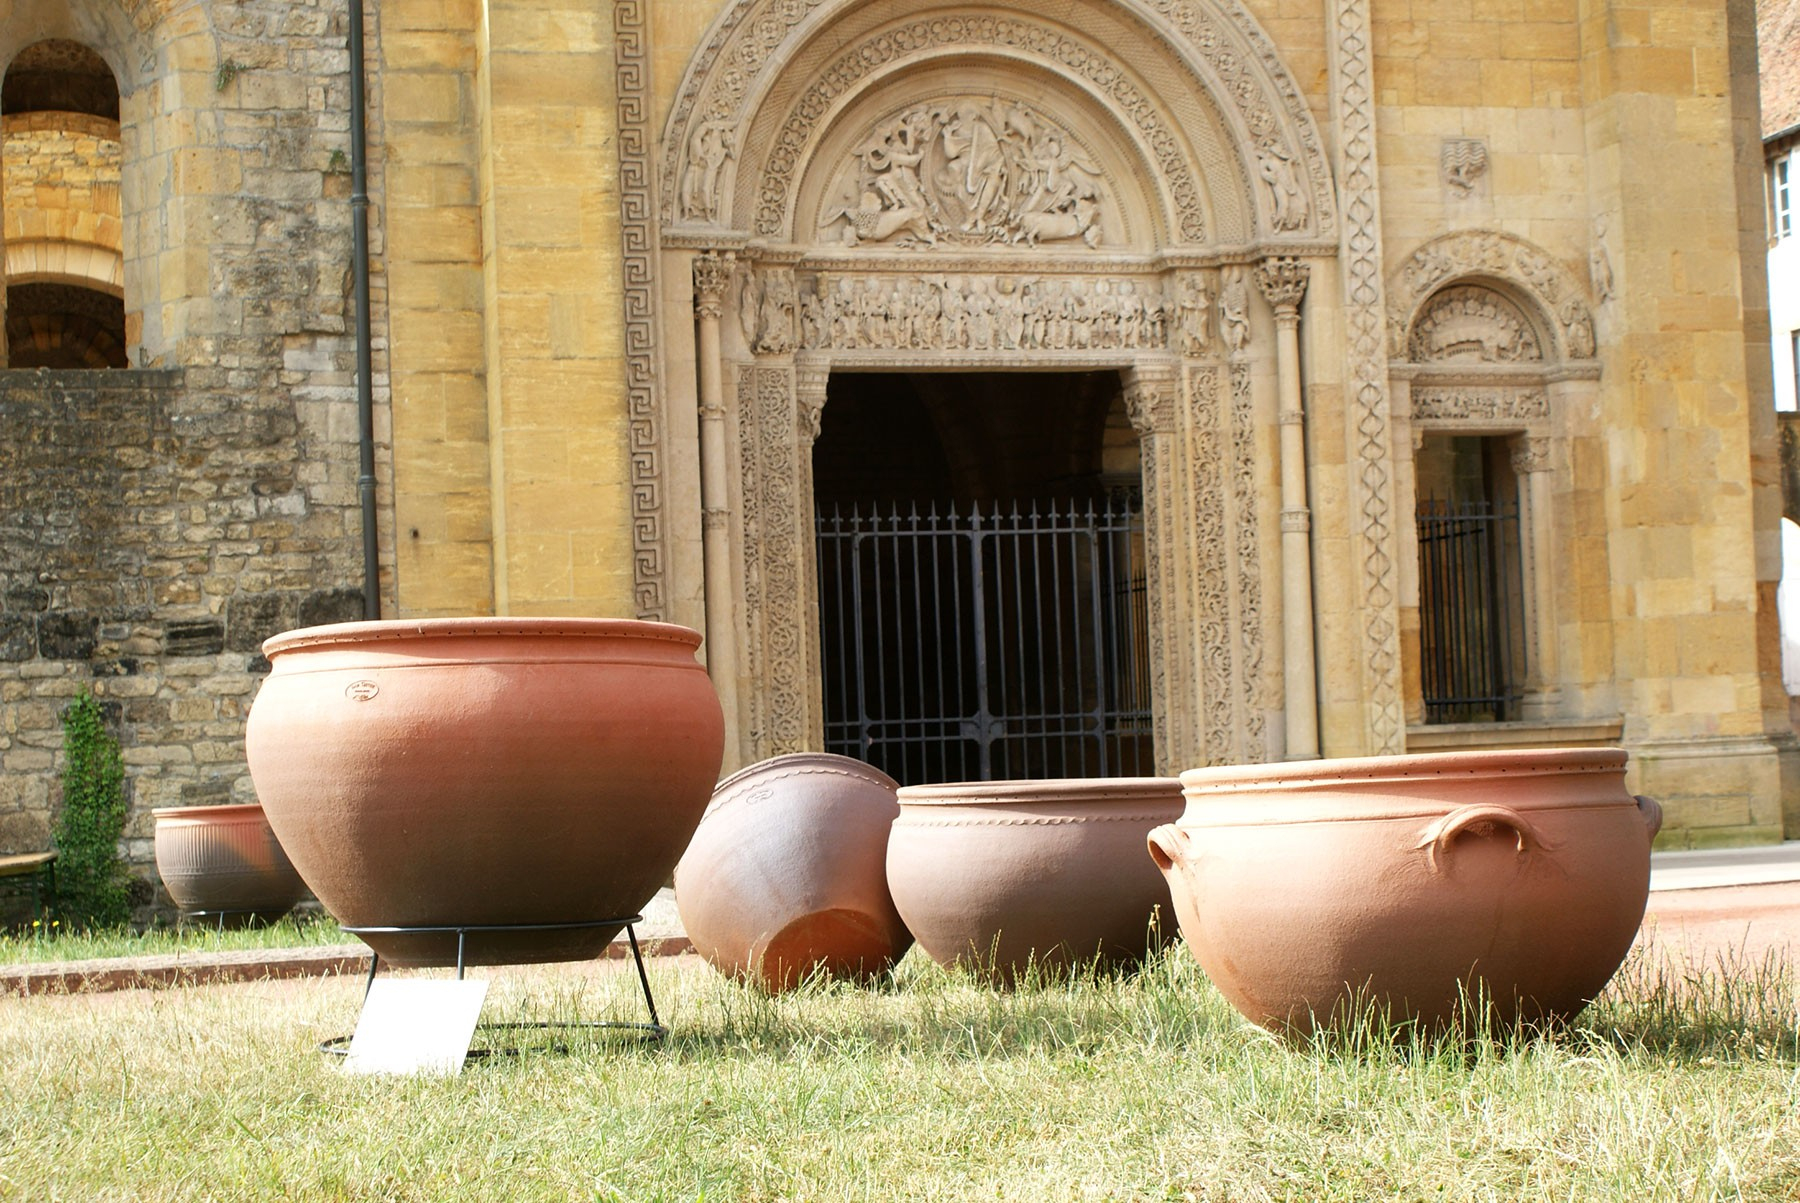 Poterie Jamet - Poteries De Jardin Tournées À La Main serapportantà Grande Poterie De Jardin